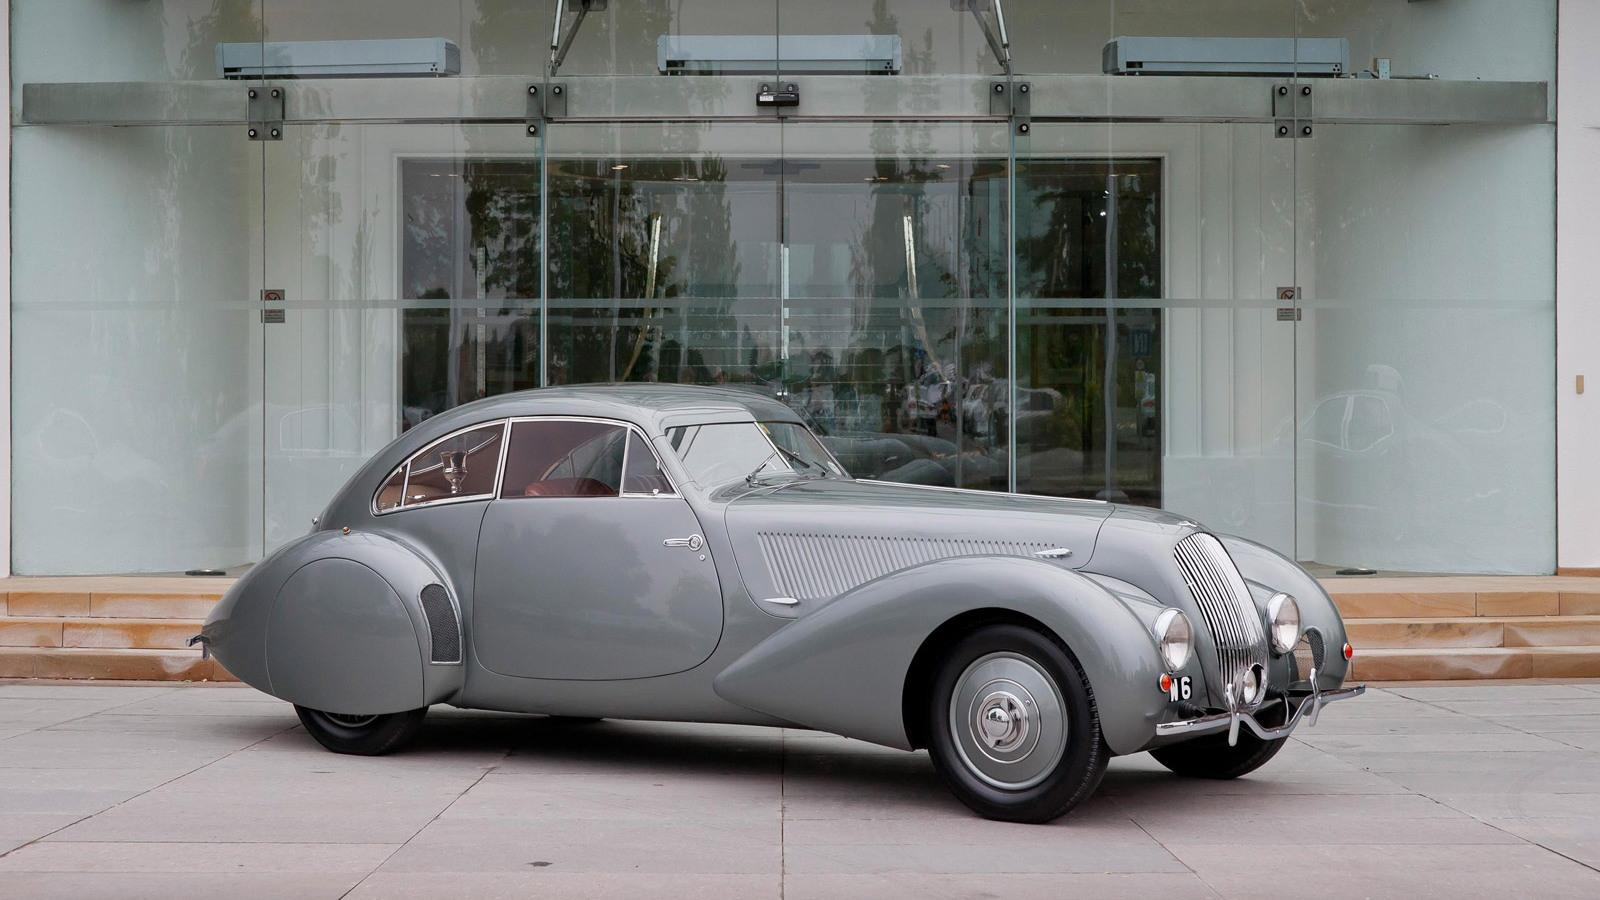 1930s-era Bentley 4 1/4 Liter 'Embiricos' Special